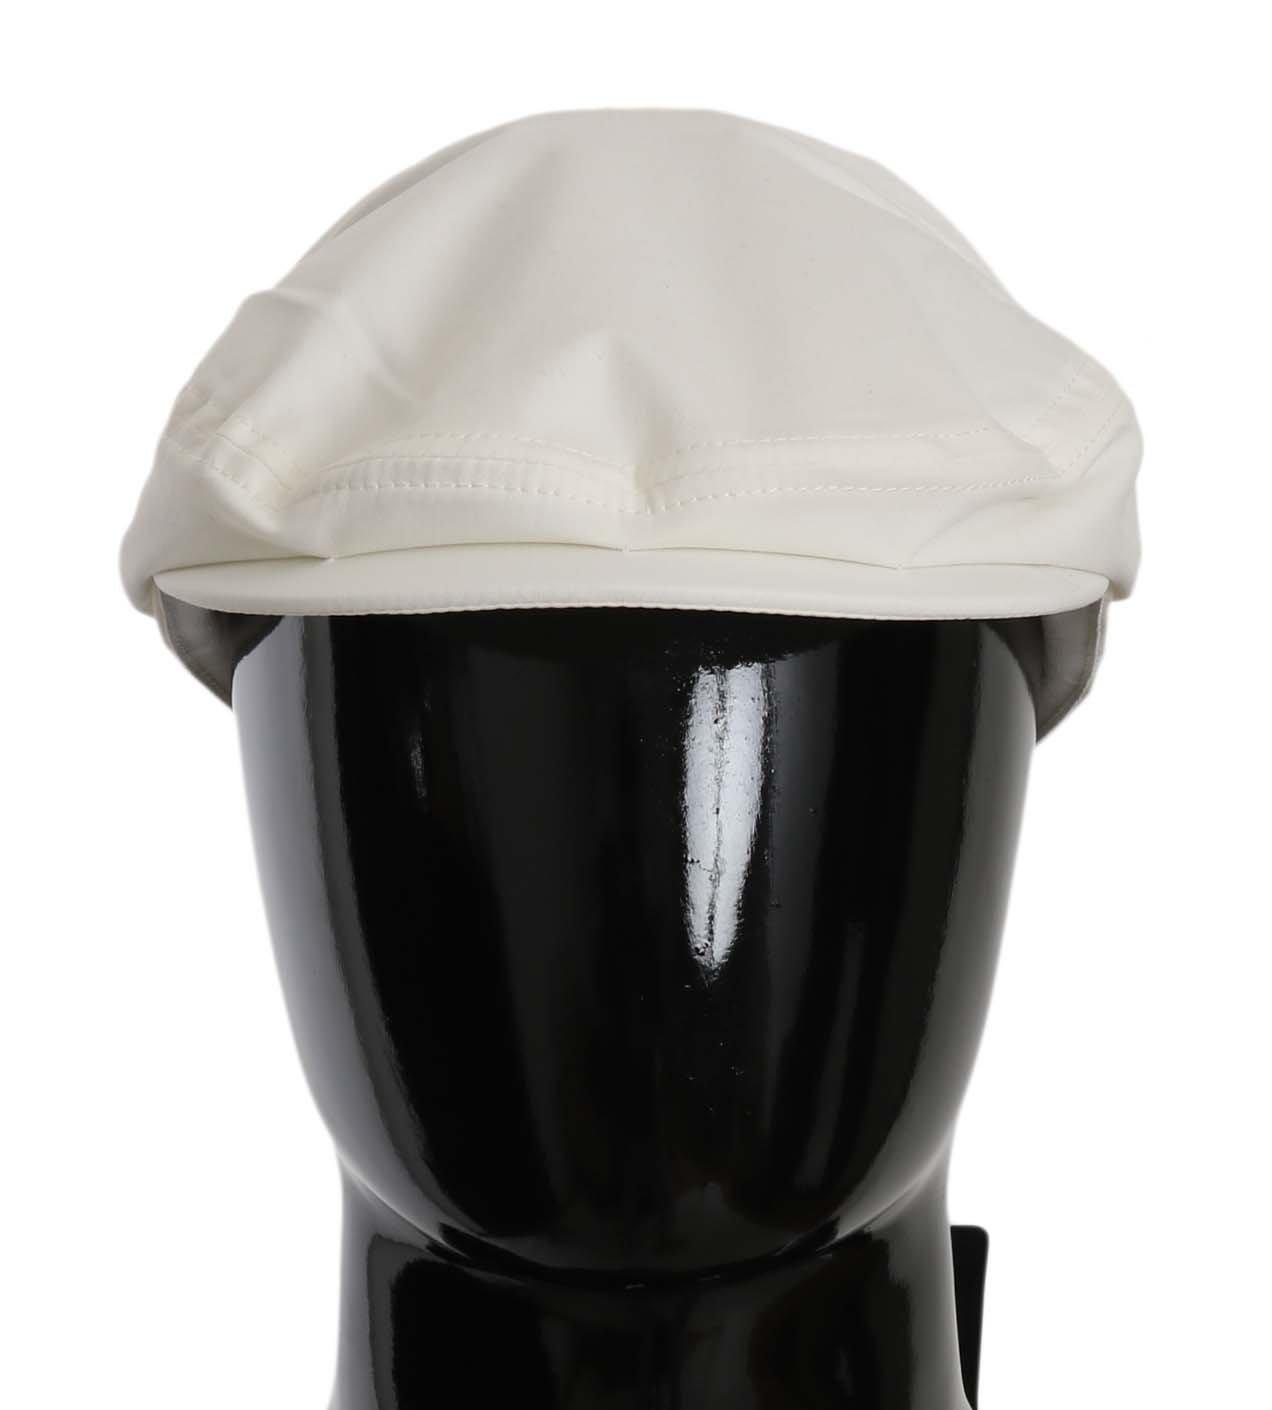 Dolce & Gabbana Men's Hat White HAT70166 - 58 cm|M